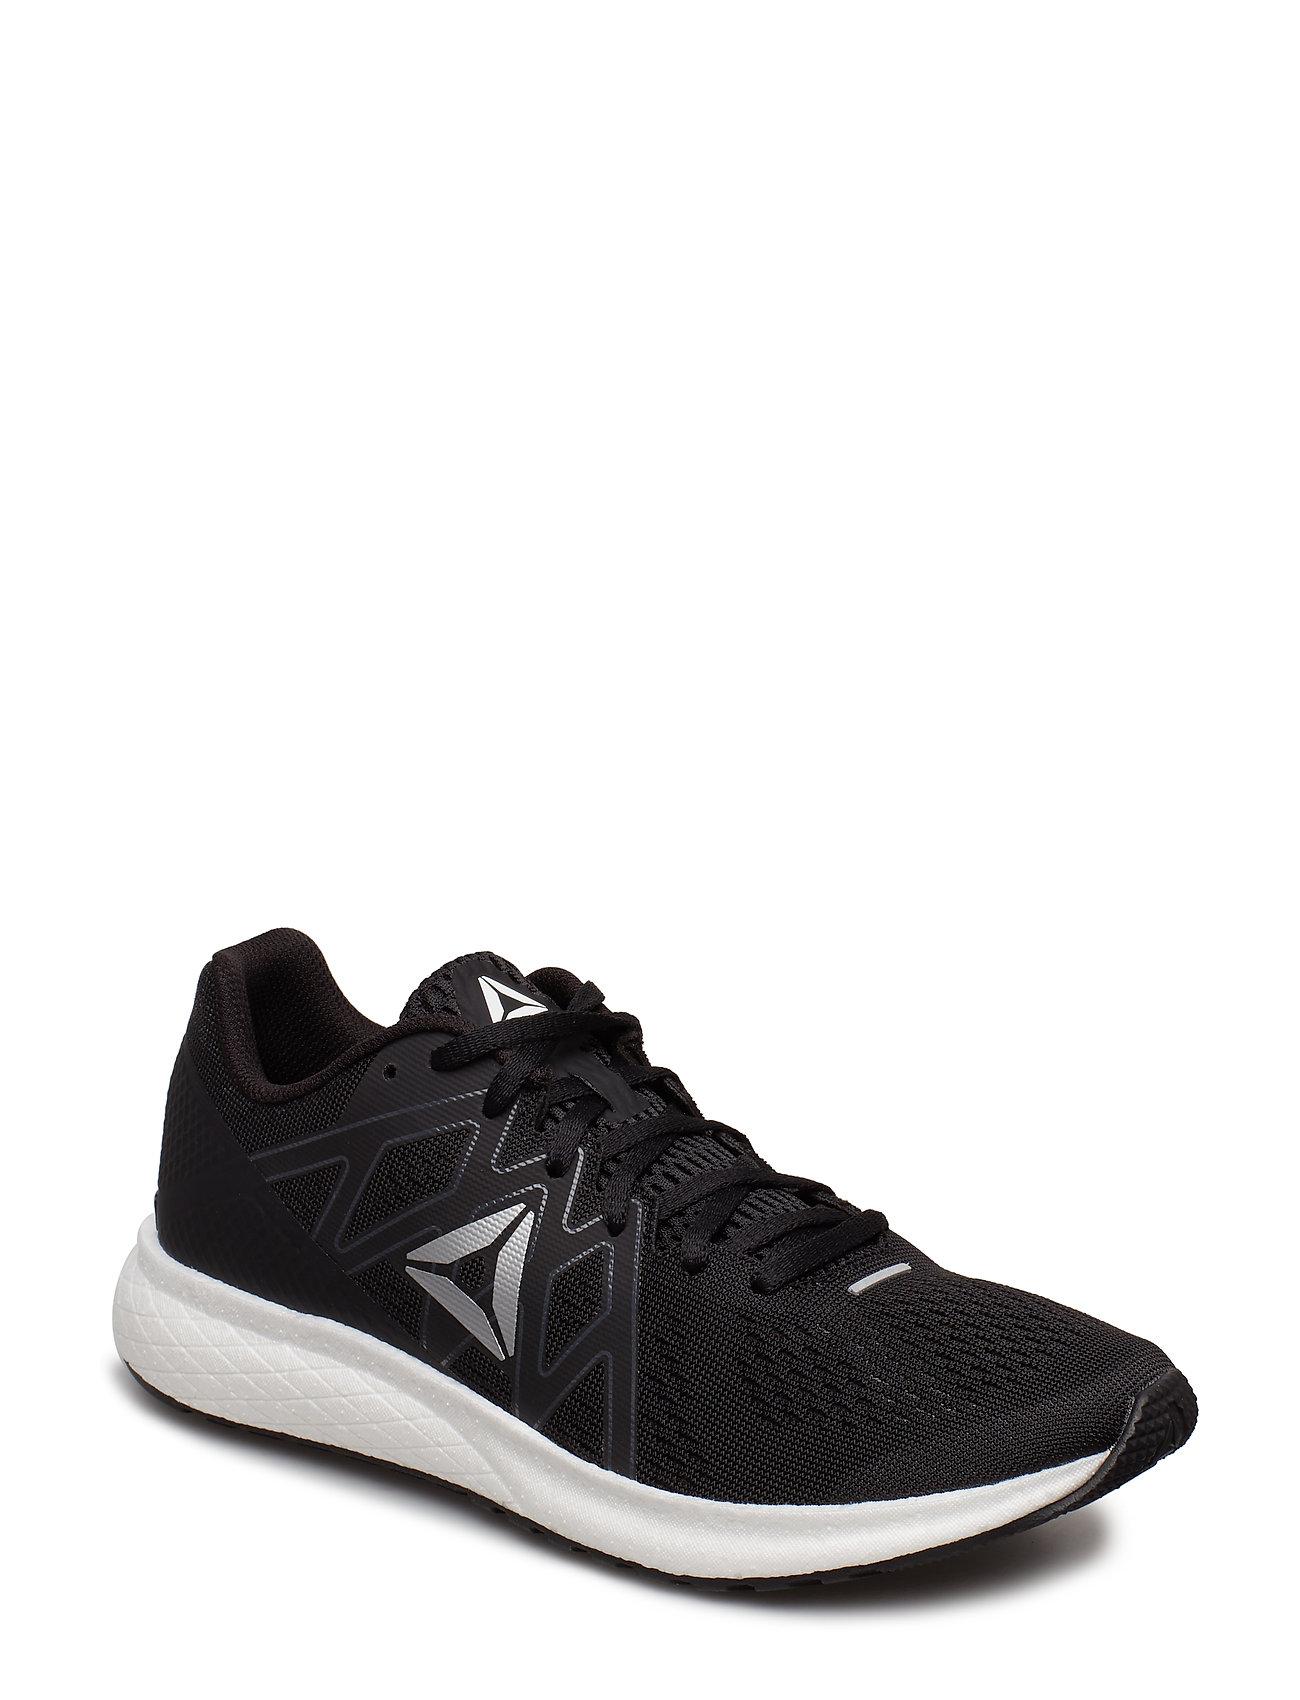 REEBOK Forever Floatride Energy Shoes Sport Shoes Running Shoes Schwarz REEBOK PERFORMANCE